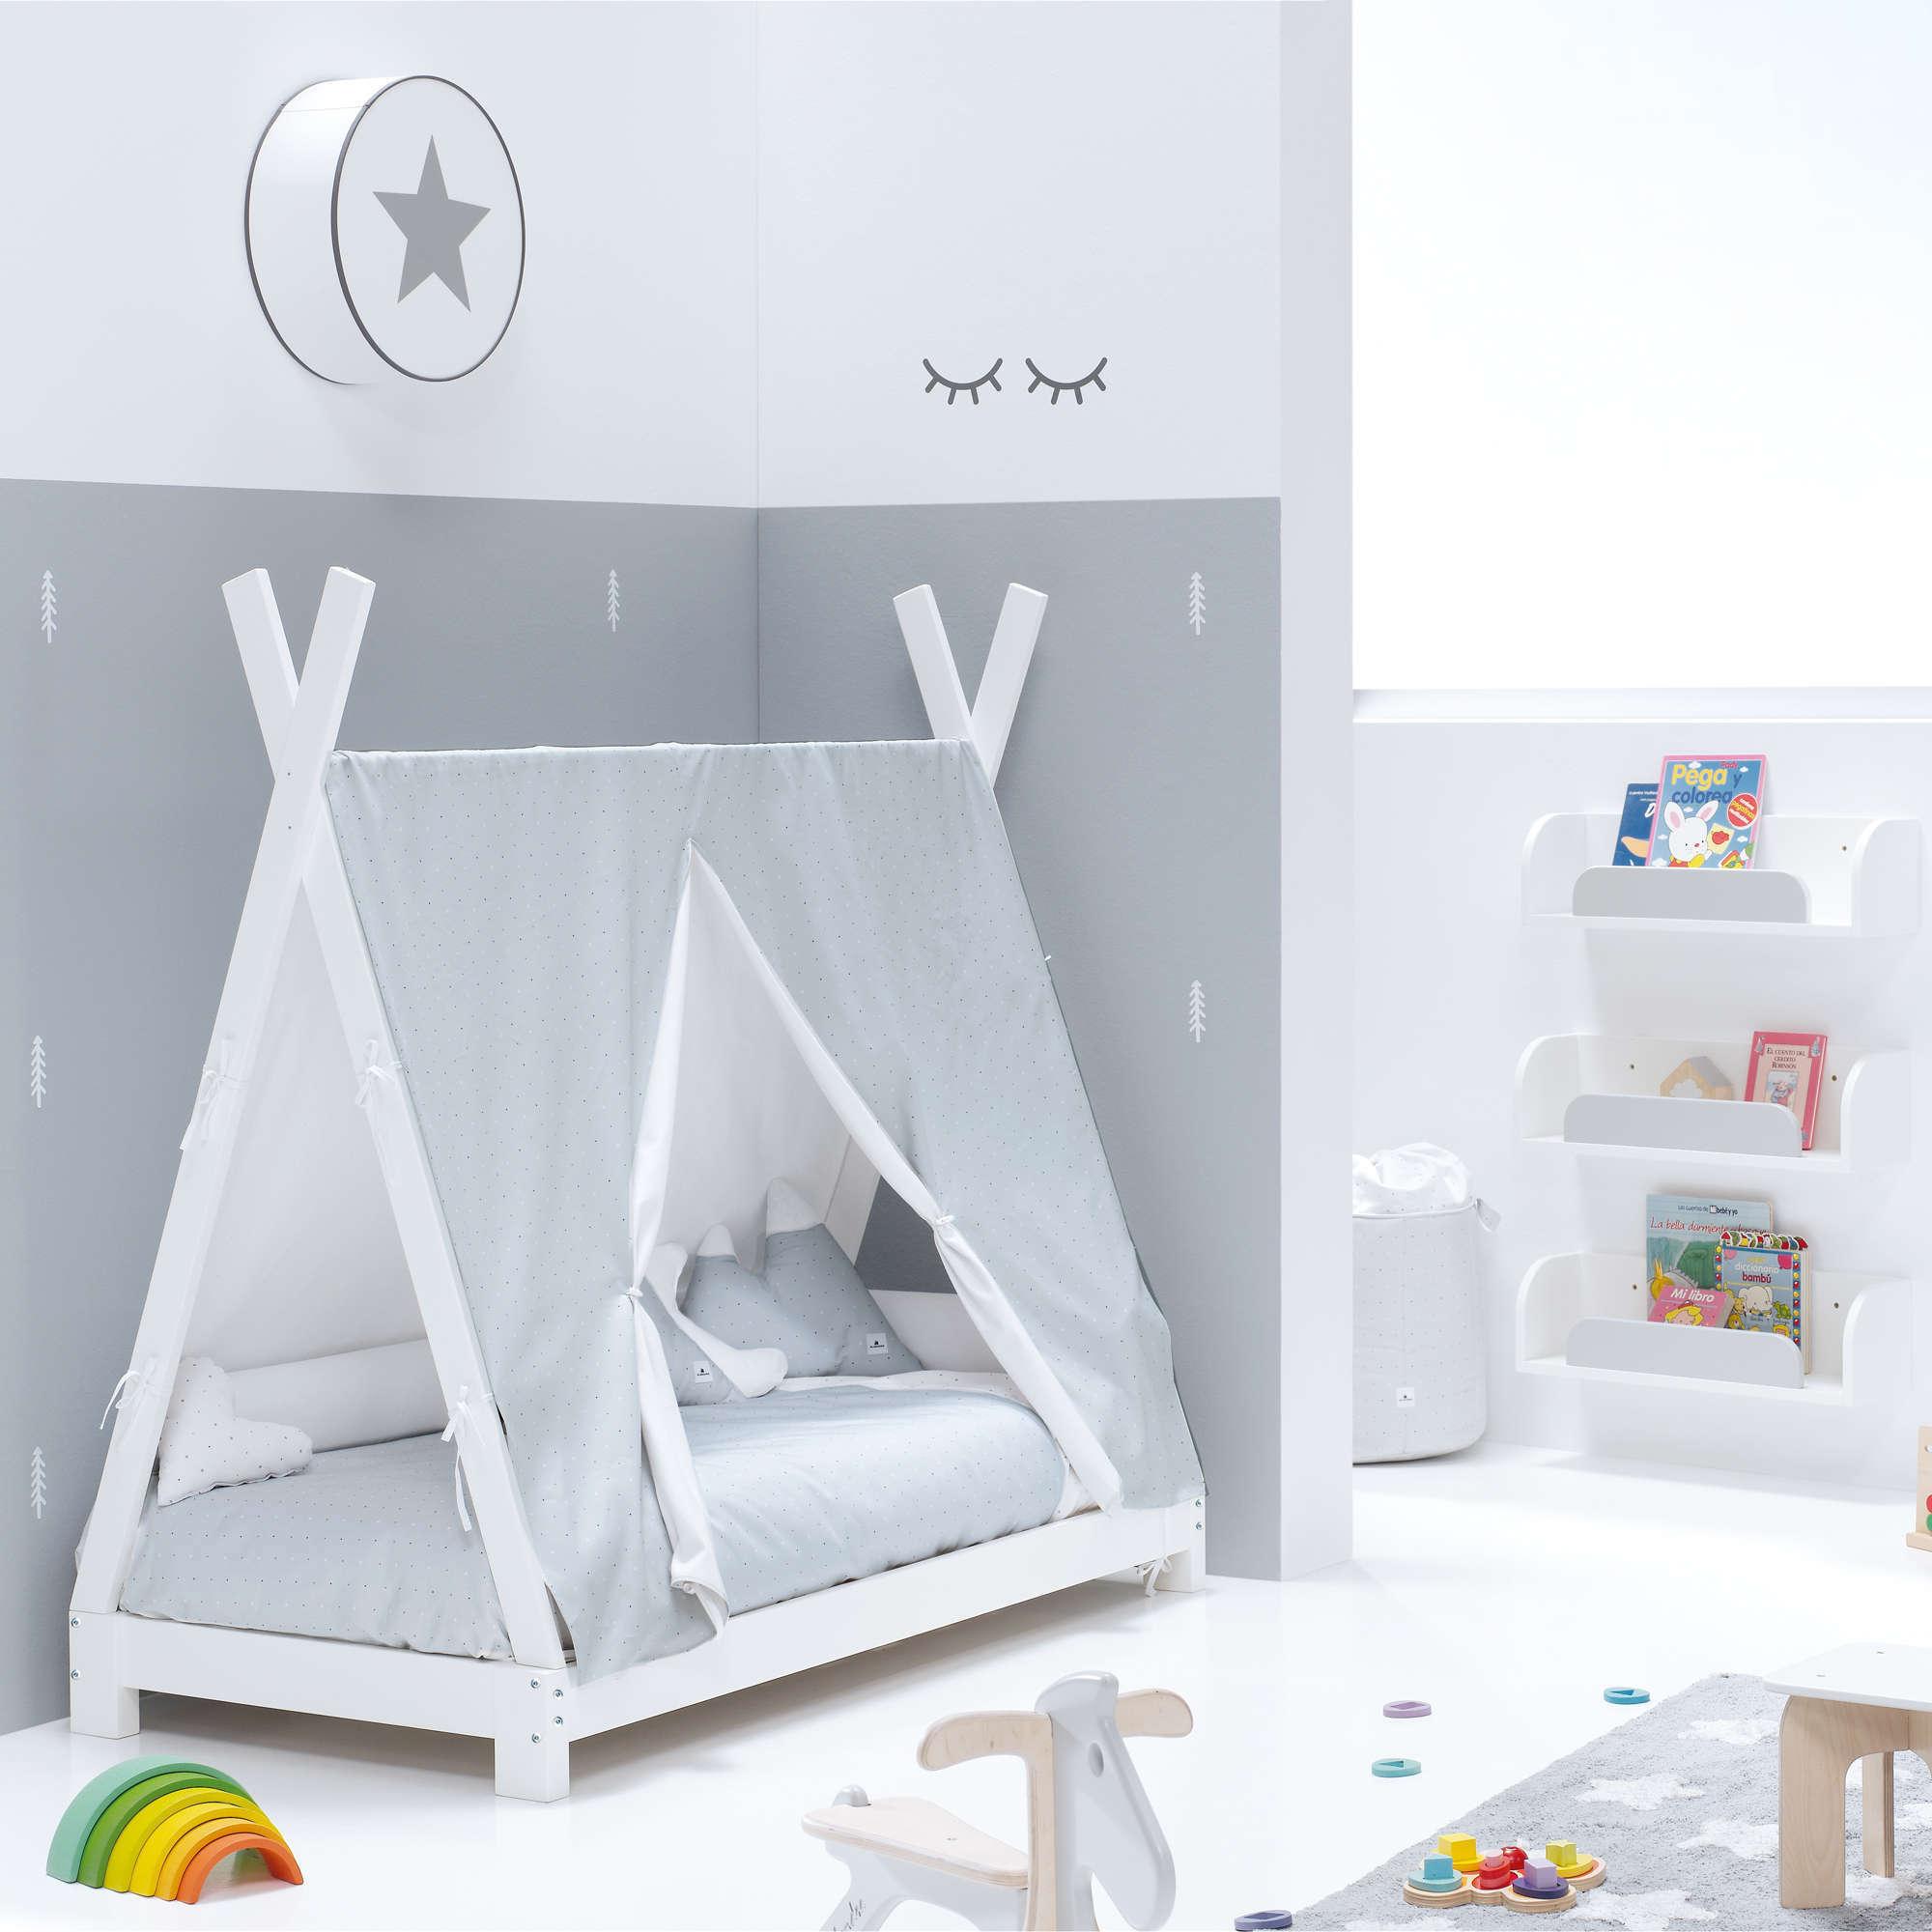 Cama Montessori Indy en gris claro Alondra